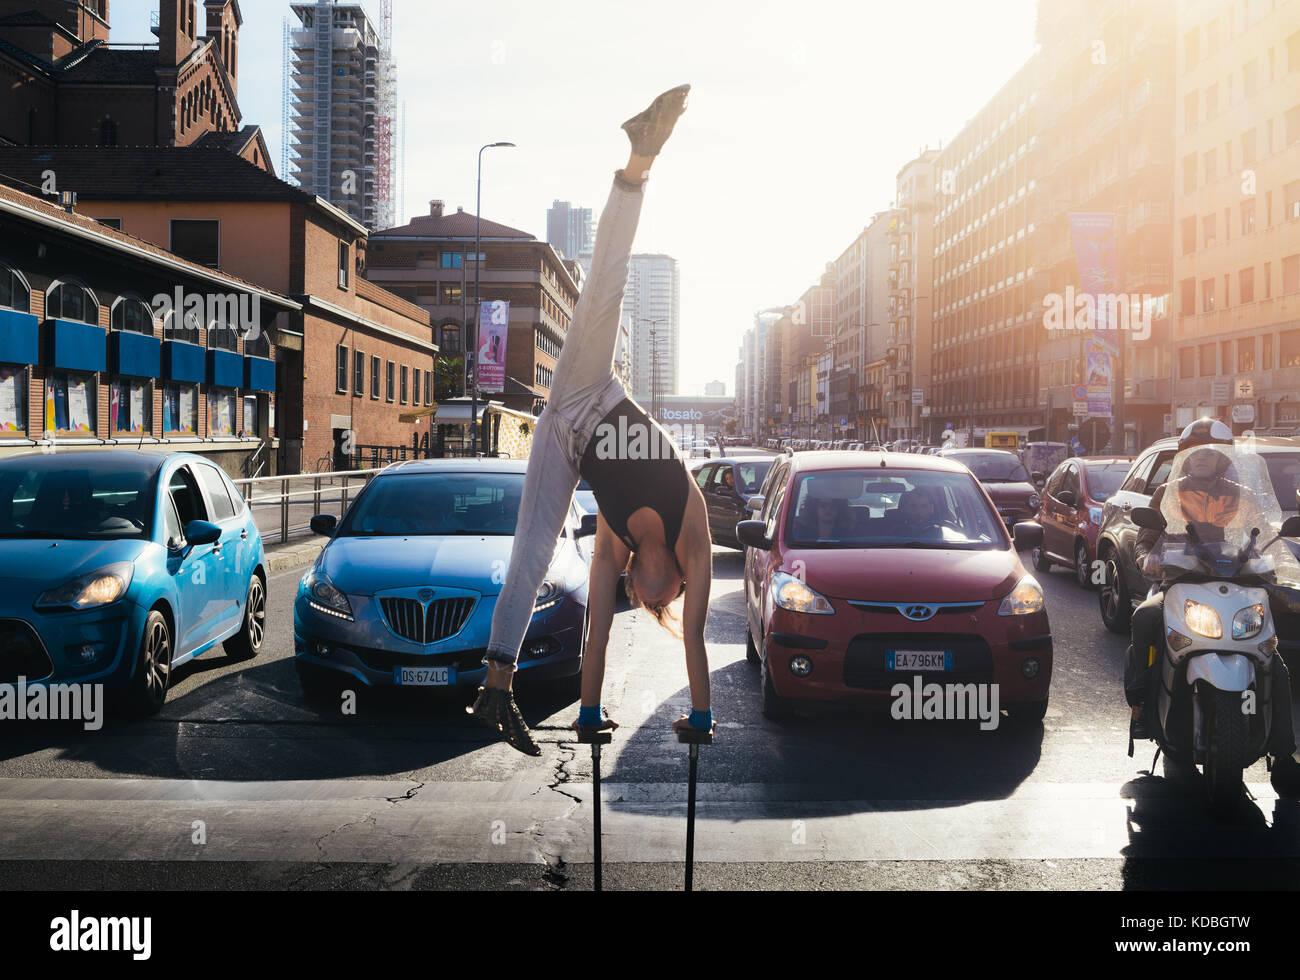 female-street-performer-on-busy-road-milan-lombardy-italy-KDBGTW.jpg